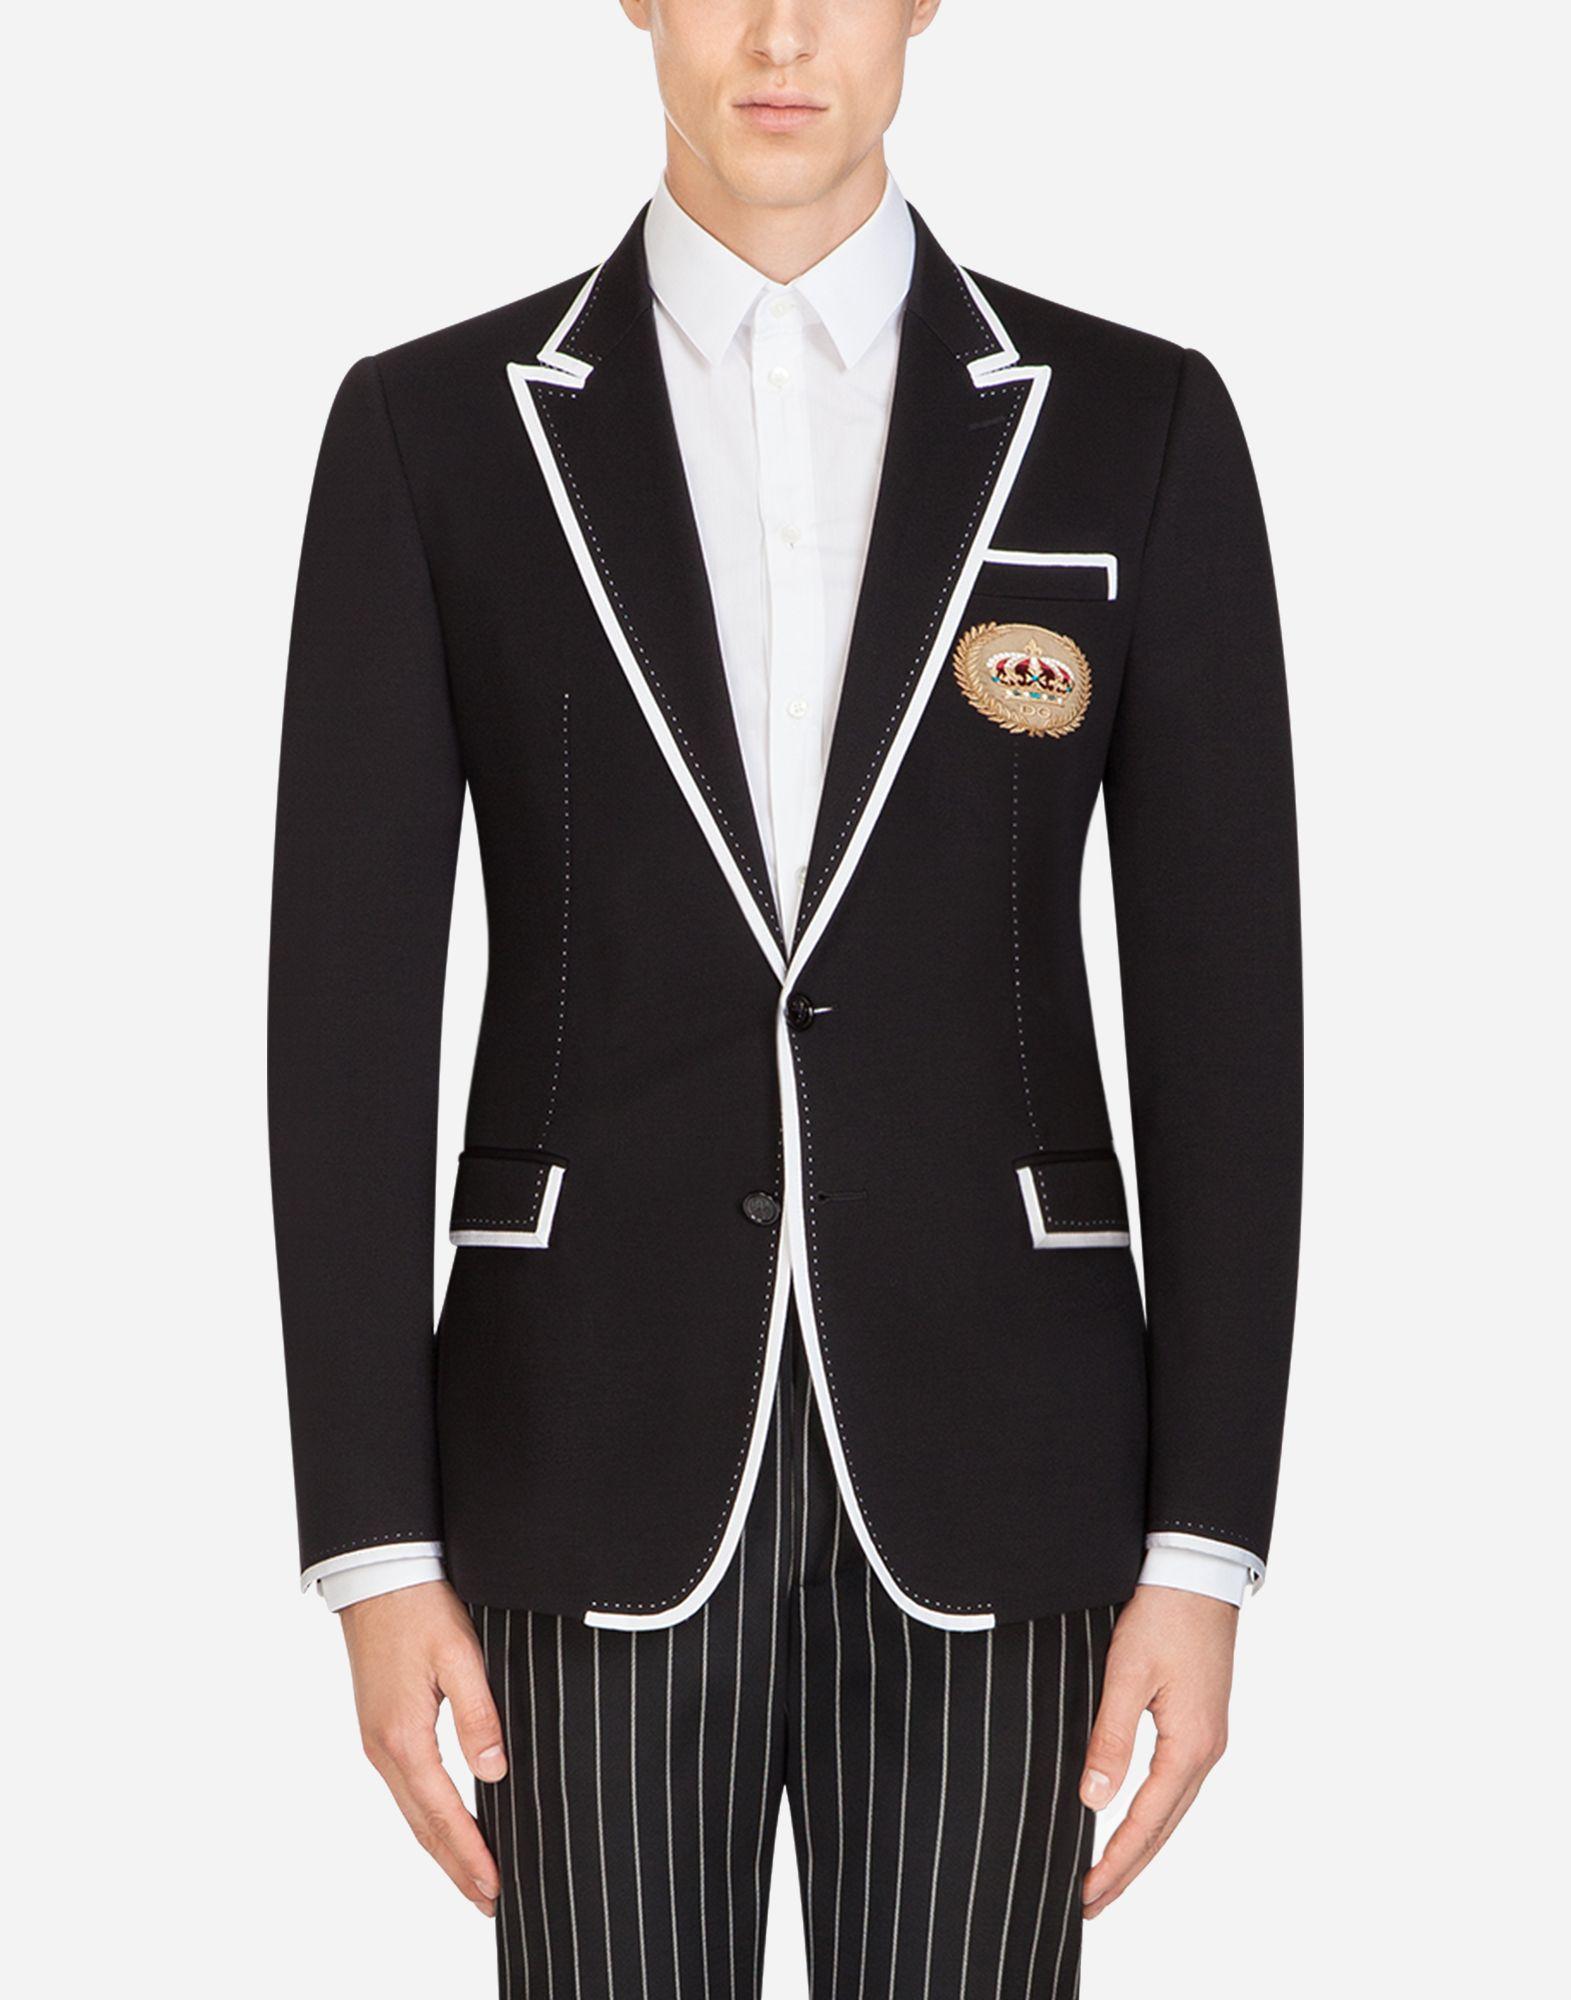 1c3e3dc16 Bonobos Jetsetter Trim Fit Stretch Velvet Dinner Jacket | Men Dress Shoes  and stylish Fashions | Velvet dinner jacket, Jackets, Chic vintage brides